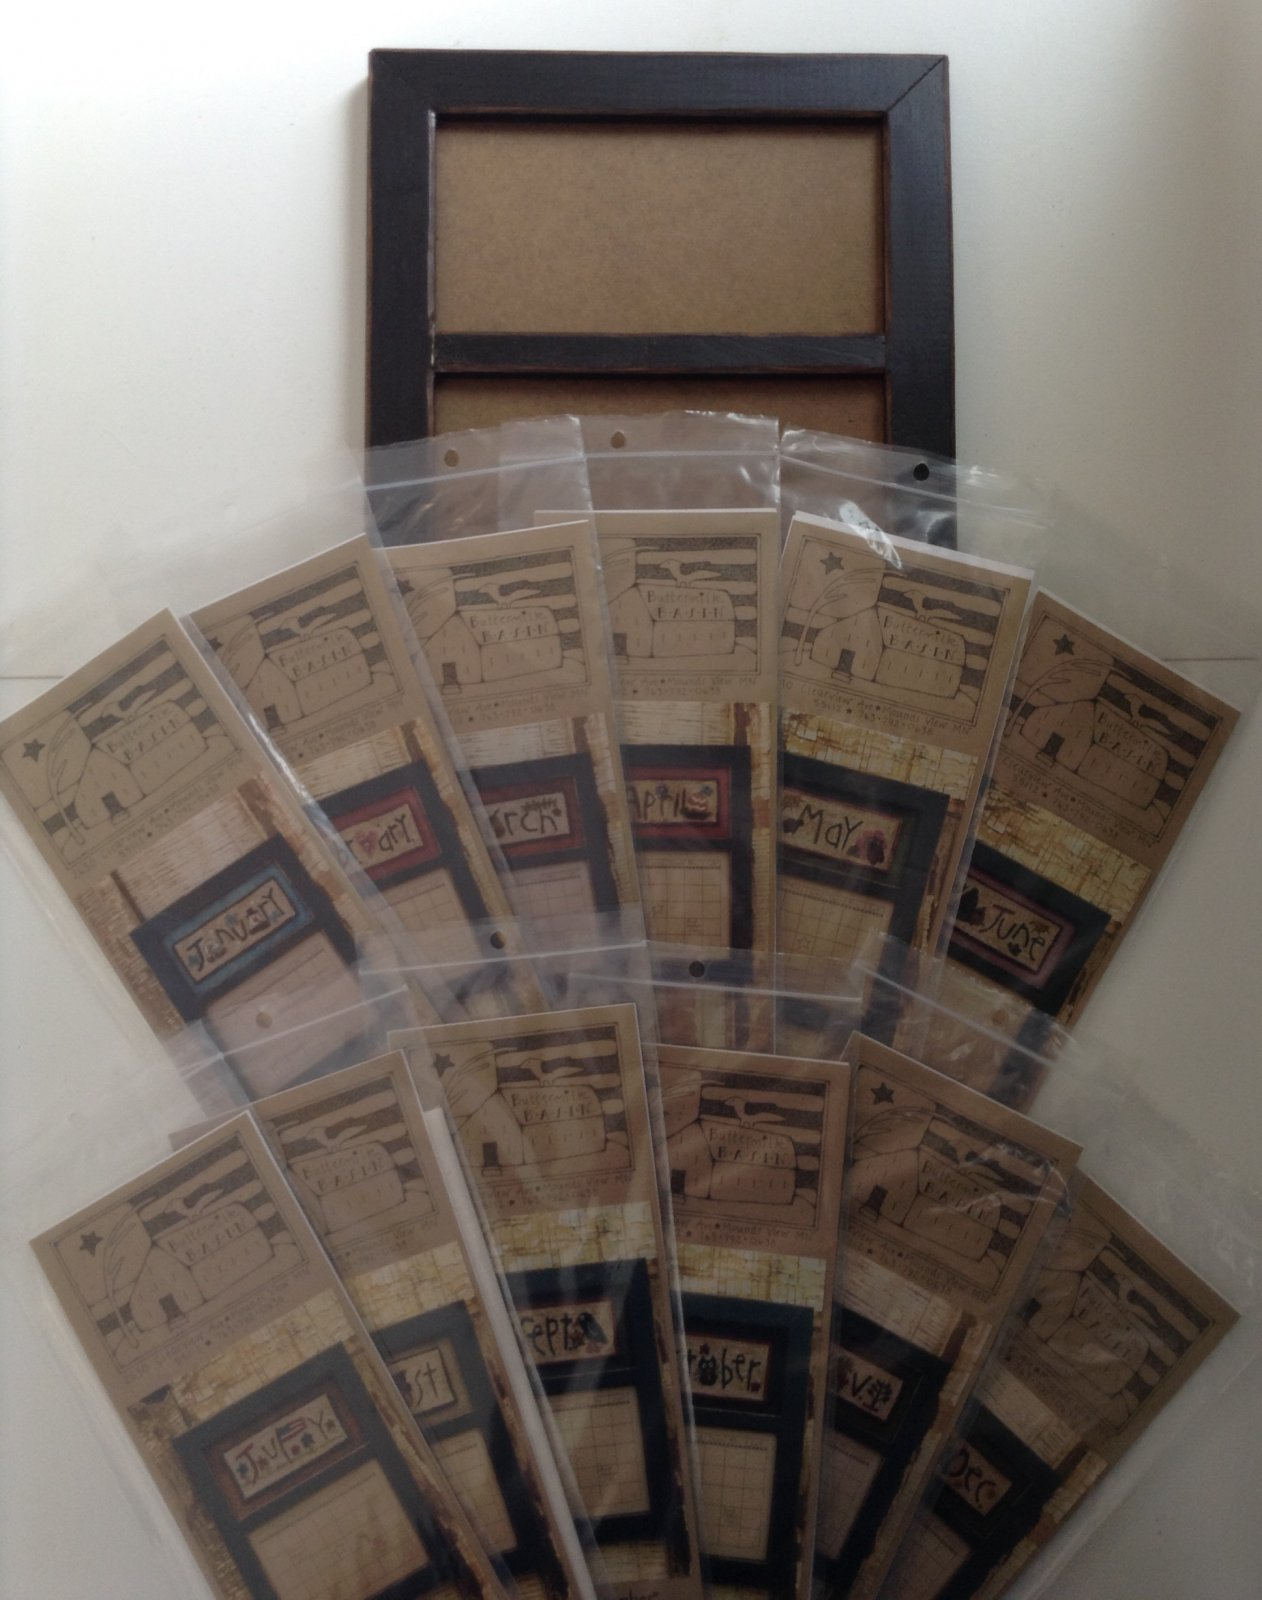 Punch needle, complete calendar kit